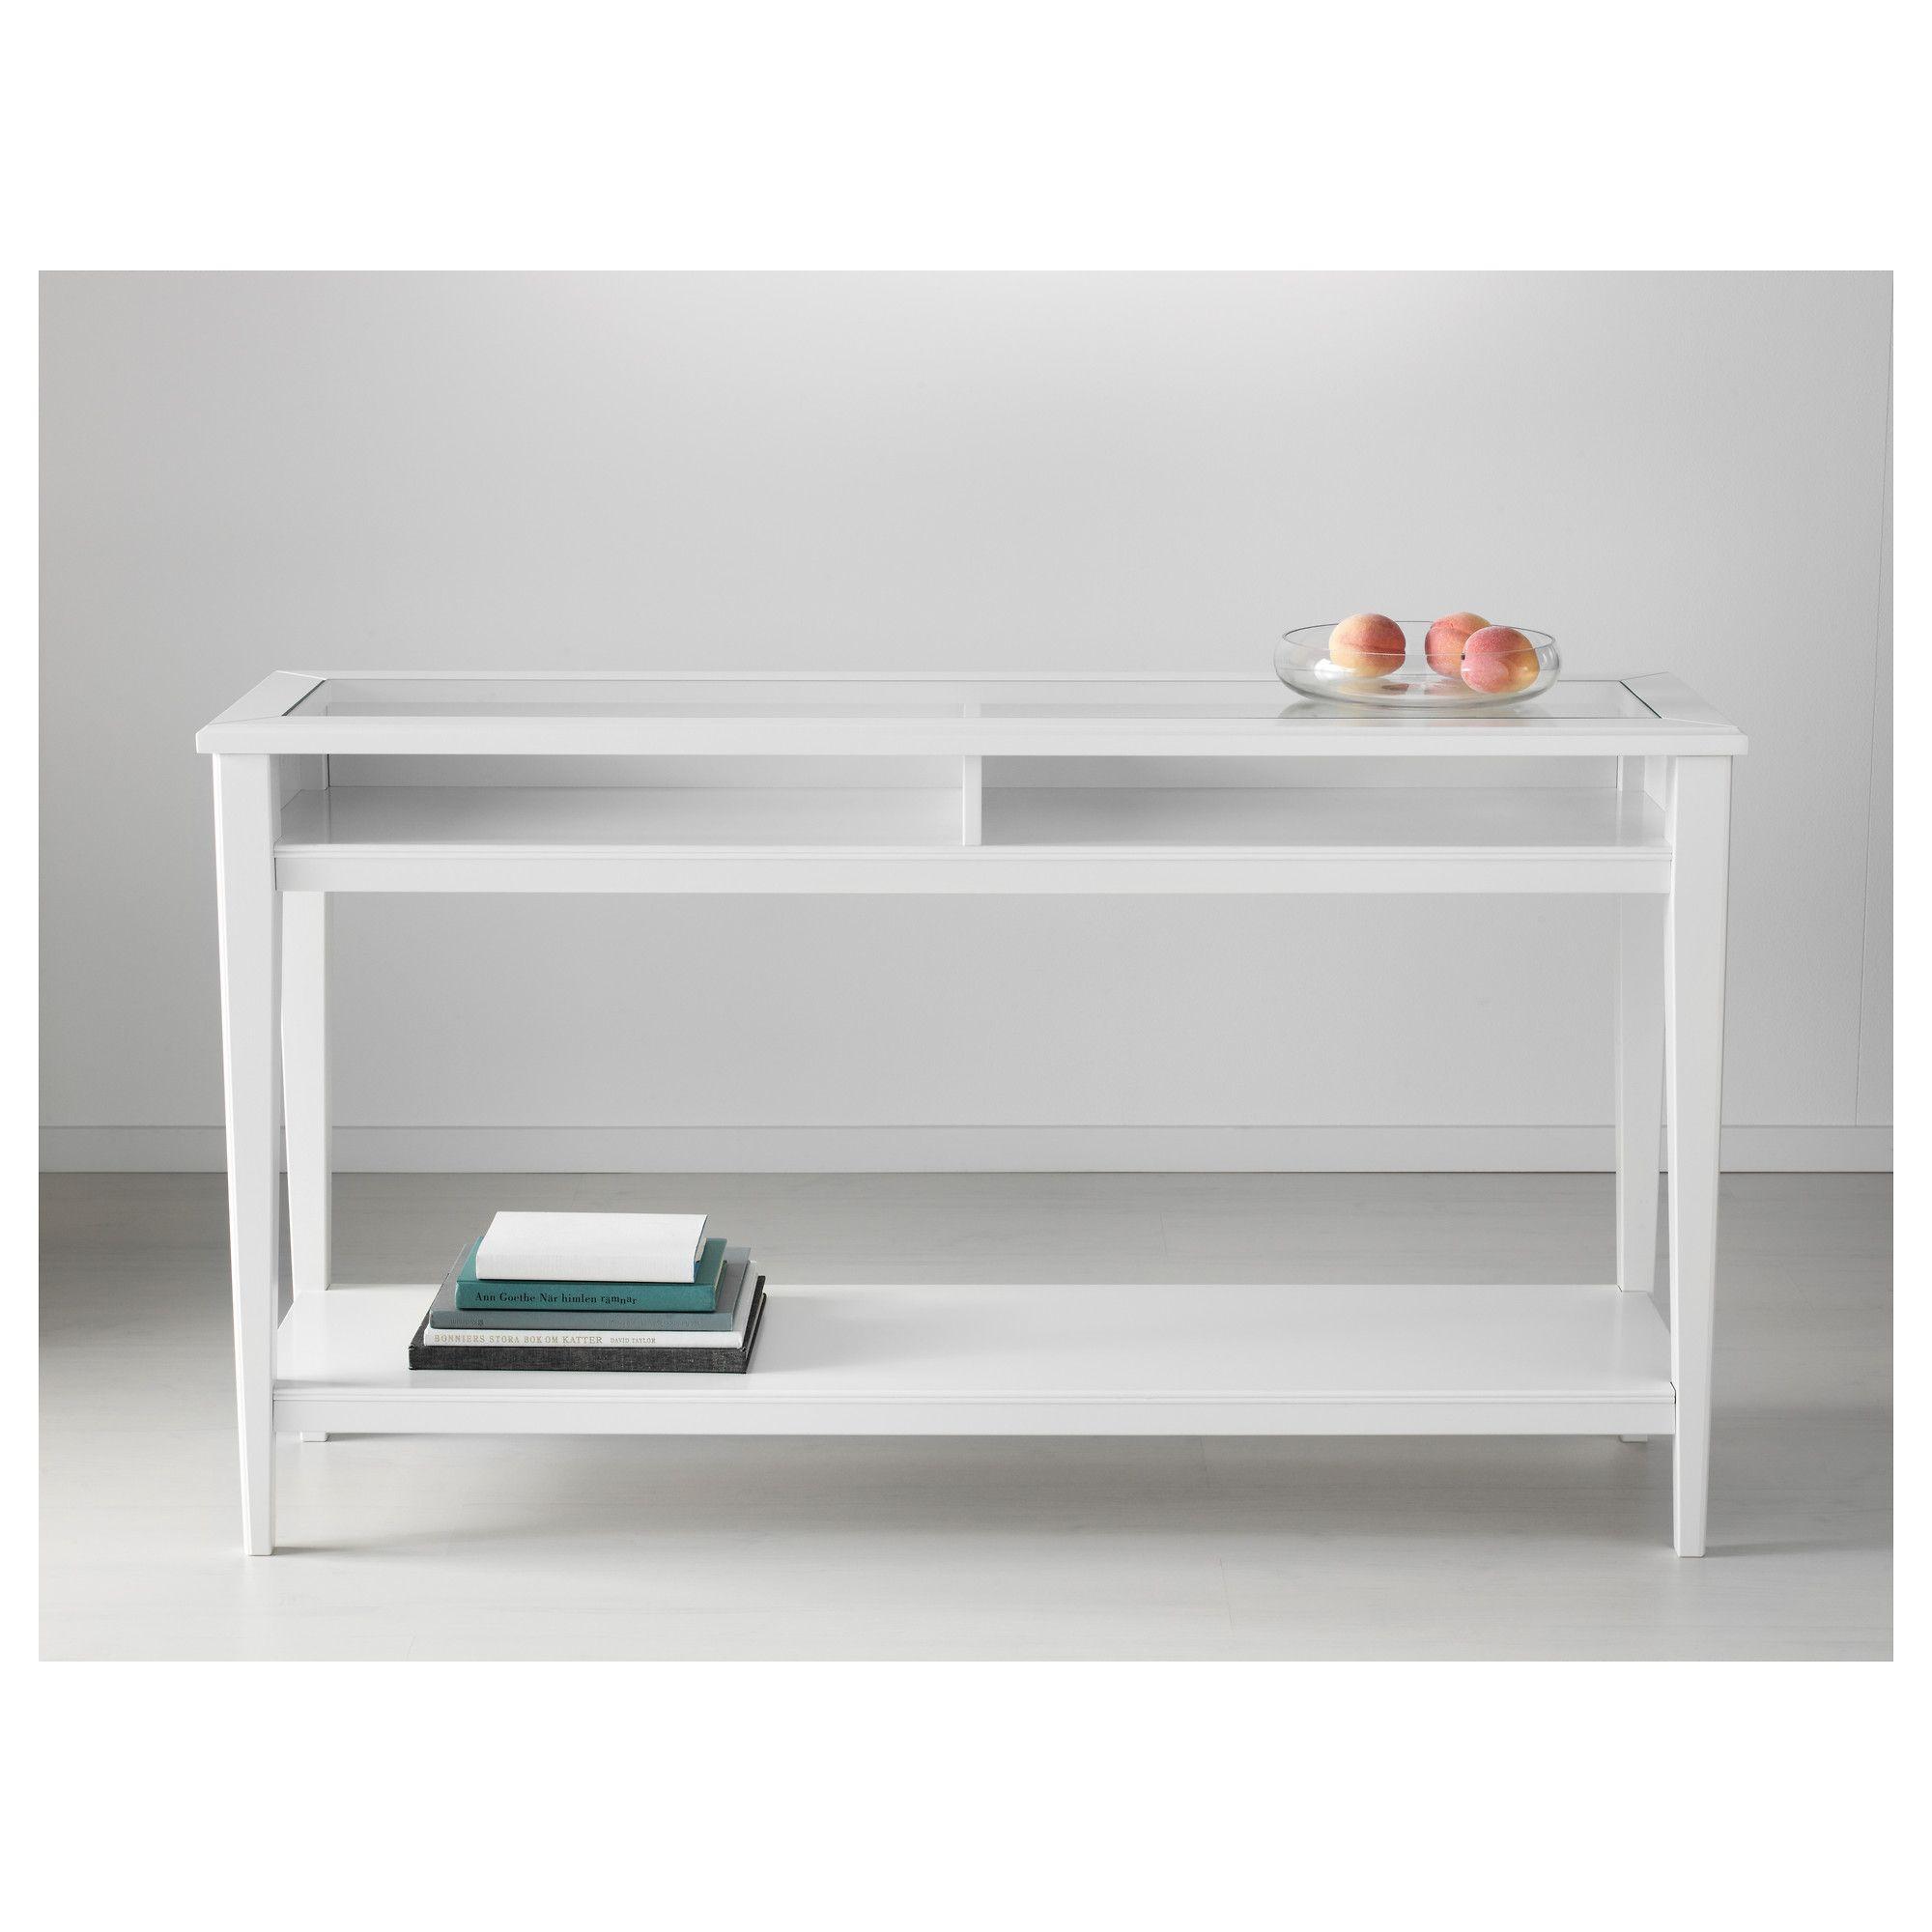 Liatorp Console Table White Glass 52 3 8x14 5 8 Ikea